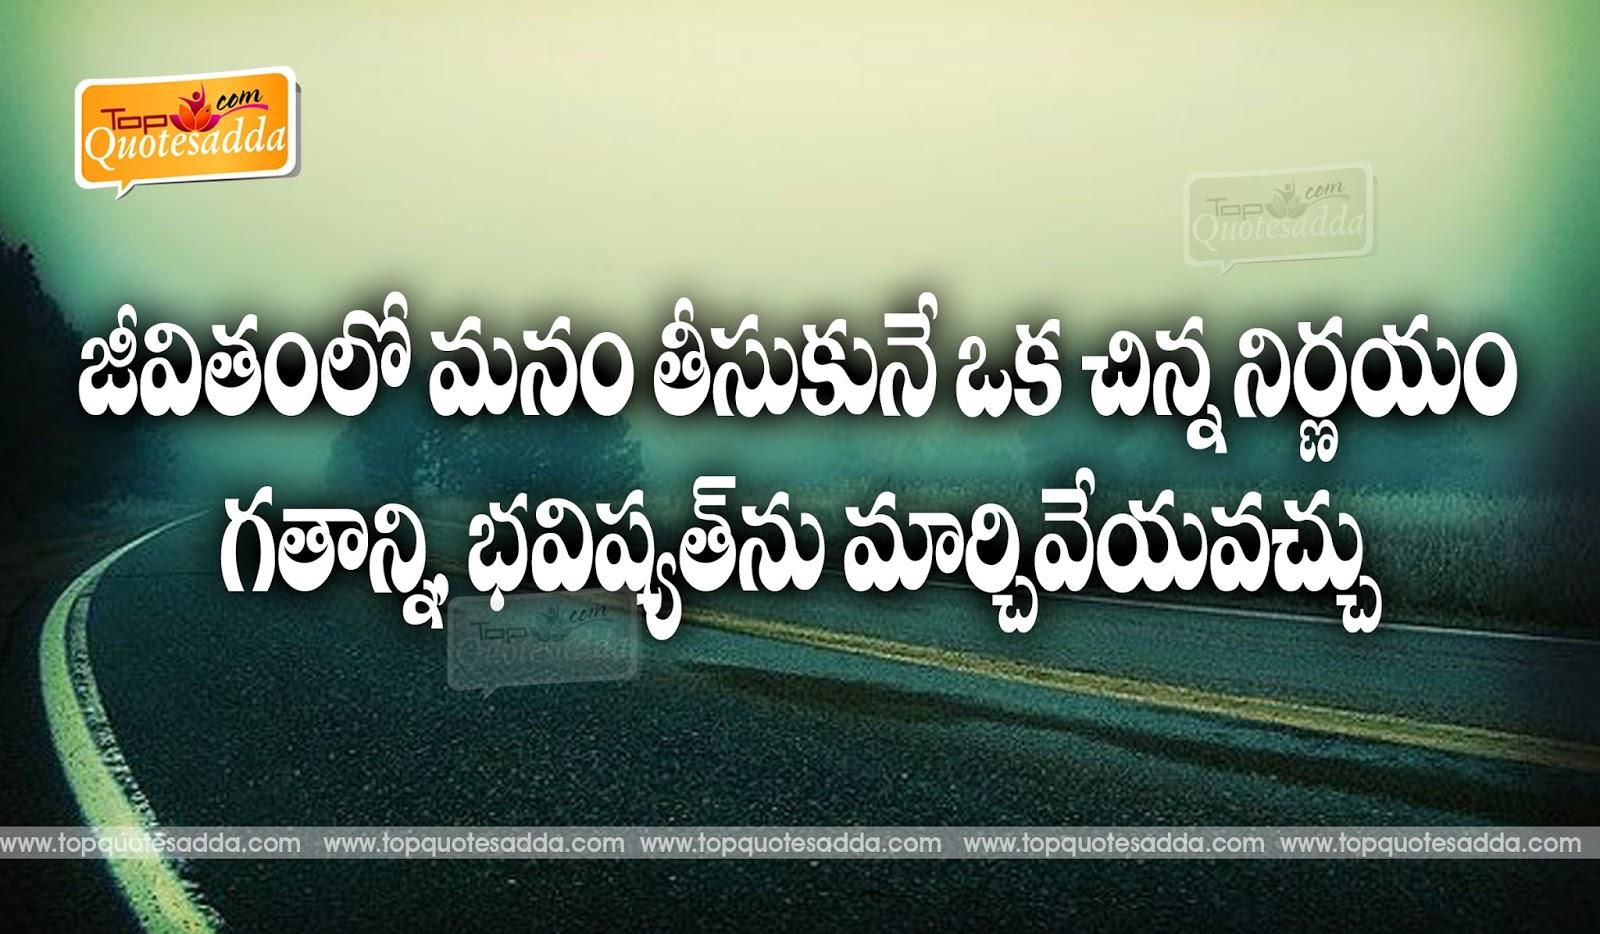 Nice Saying Life Quotes In Telugu Language Topquotesadda Telugu